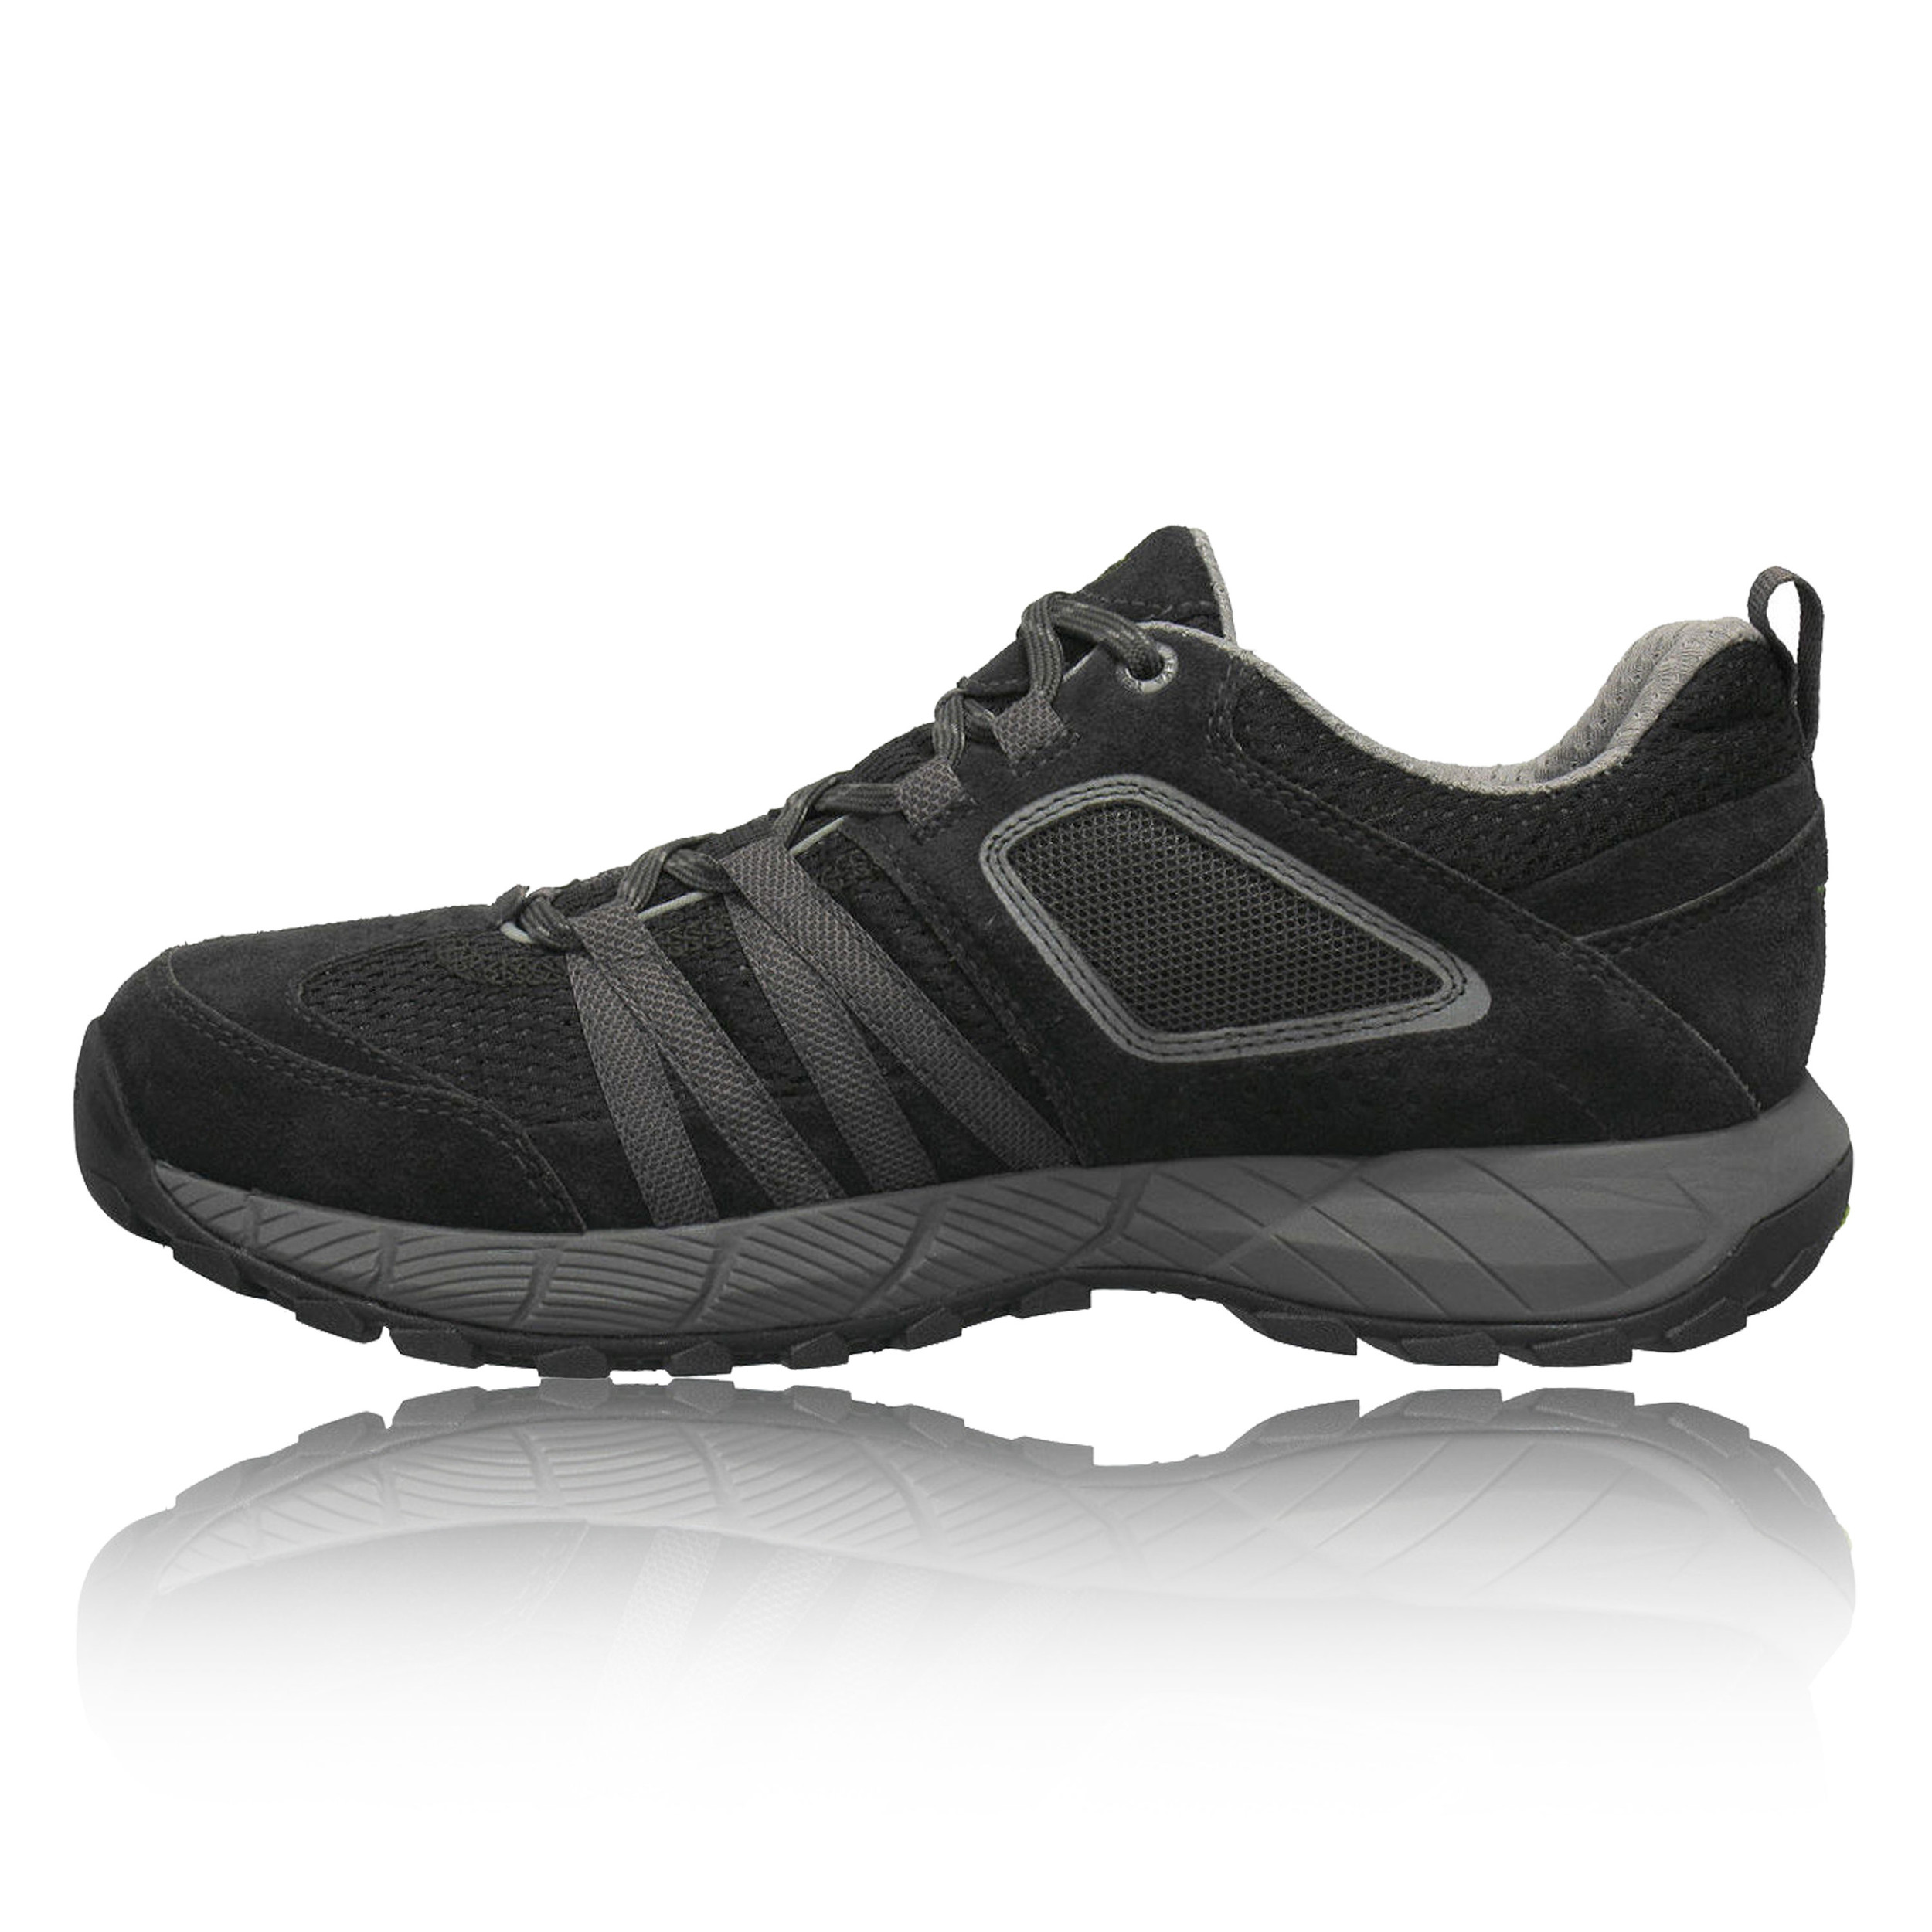 Teva Wapta Waterproof Walking Shoes